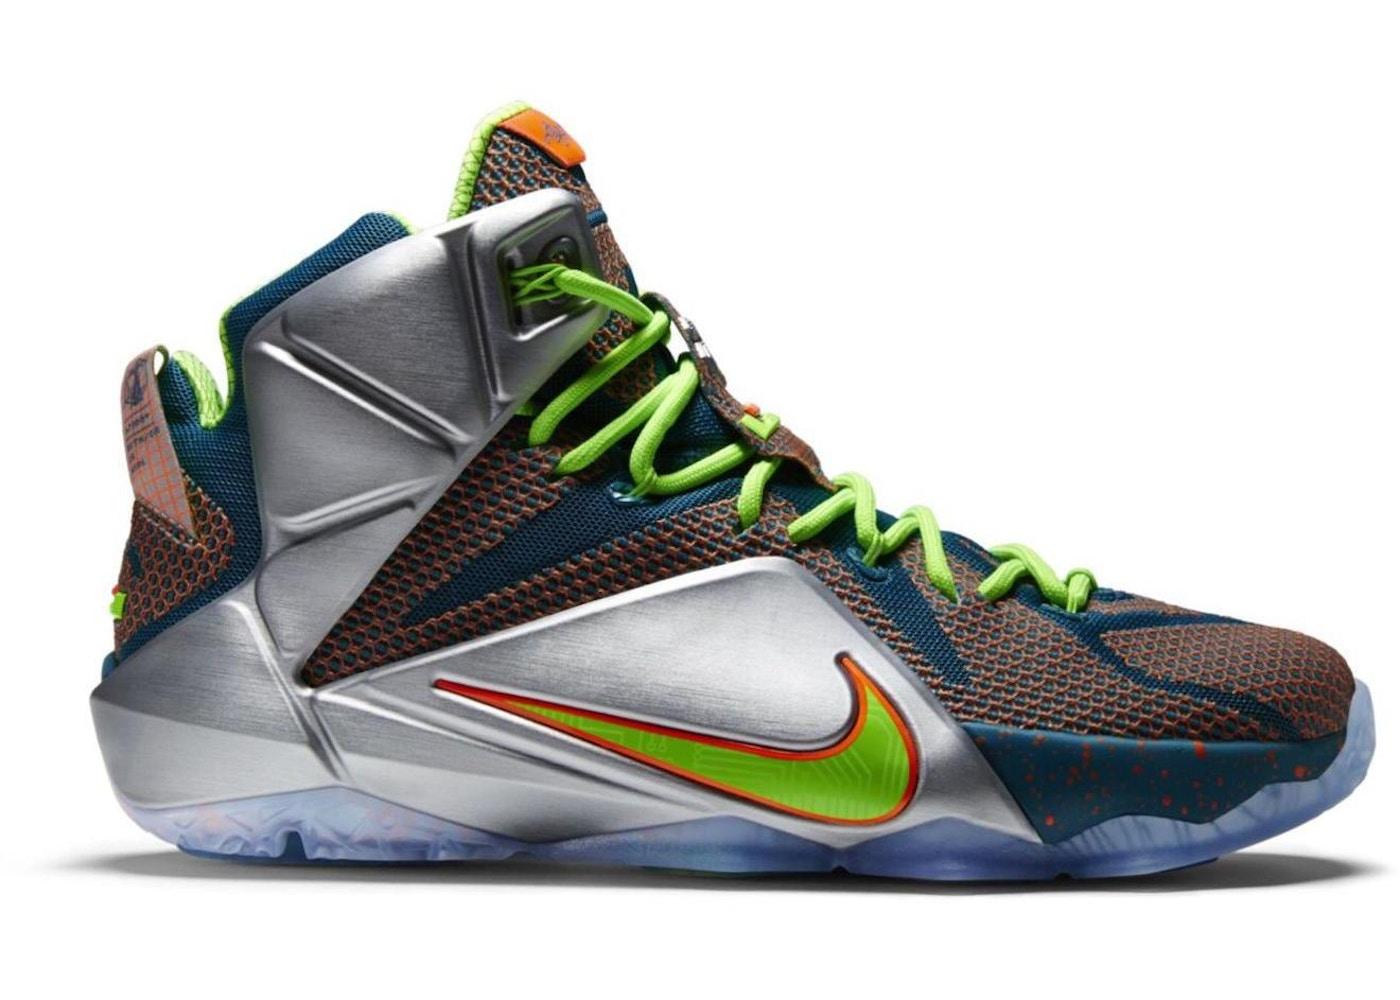 buy popular 247dc 9a7b9 Buy Nike LeBron 12 Shoes   Deadstock Sneakers